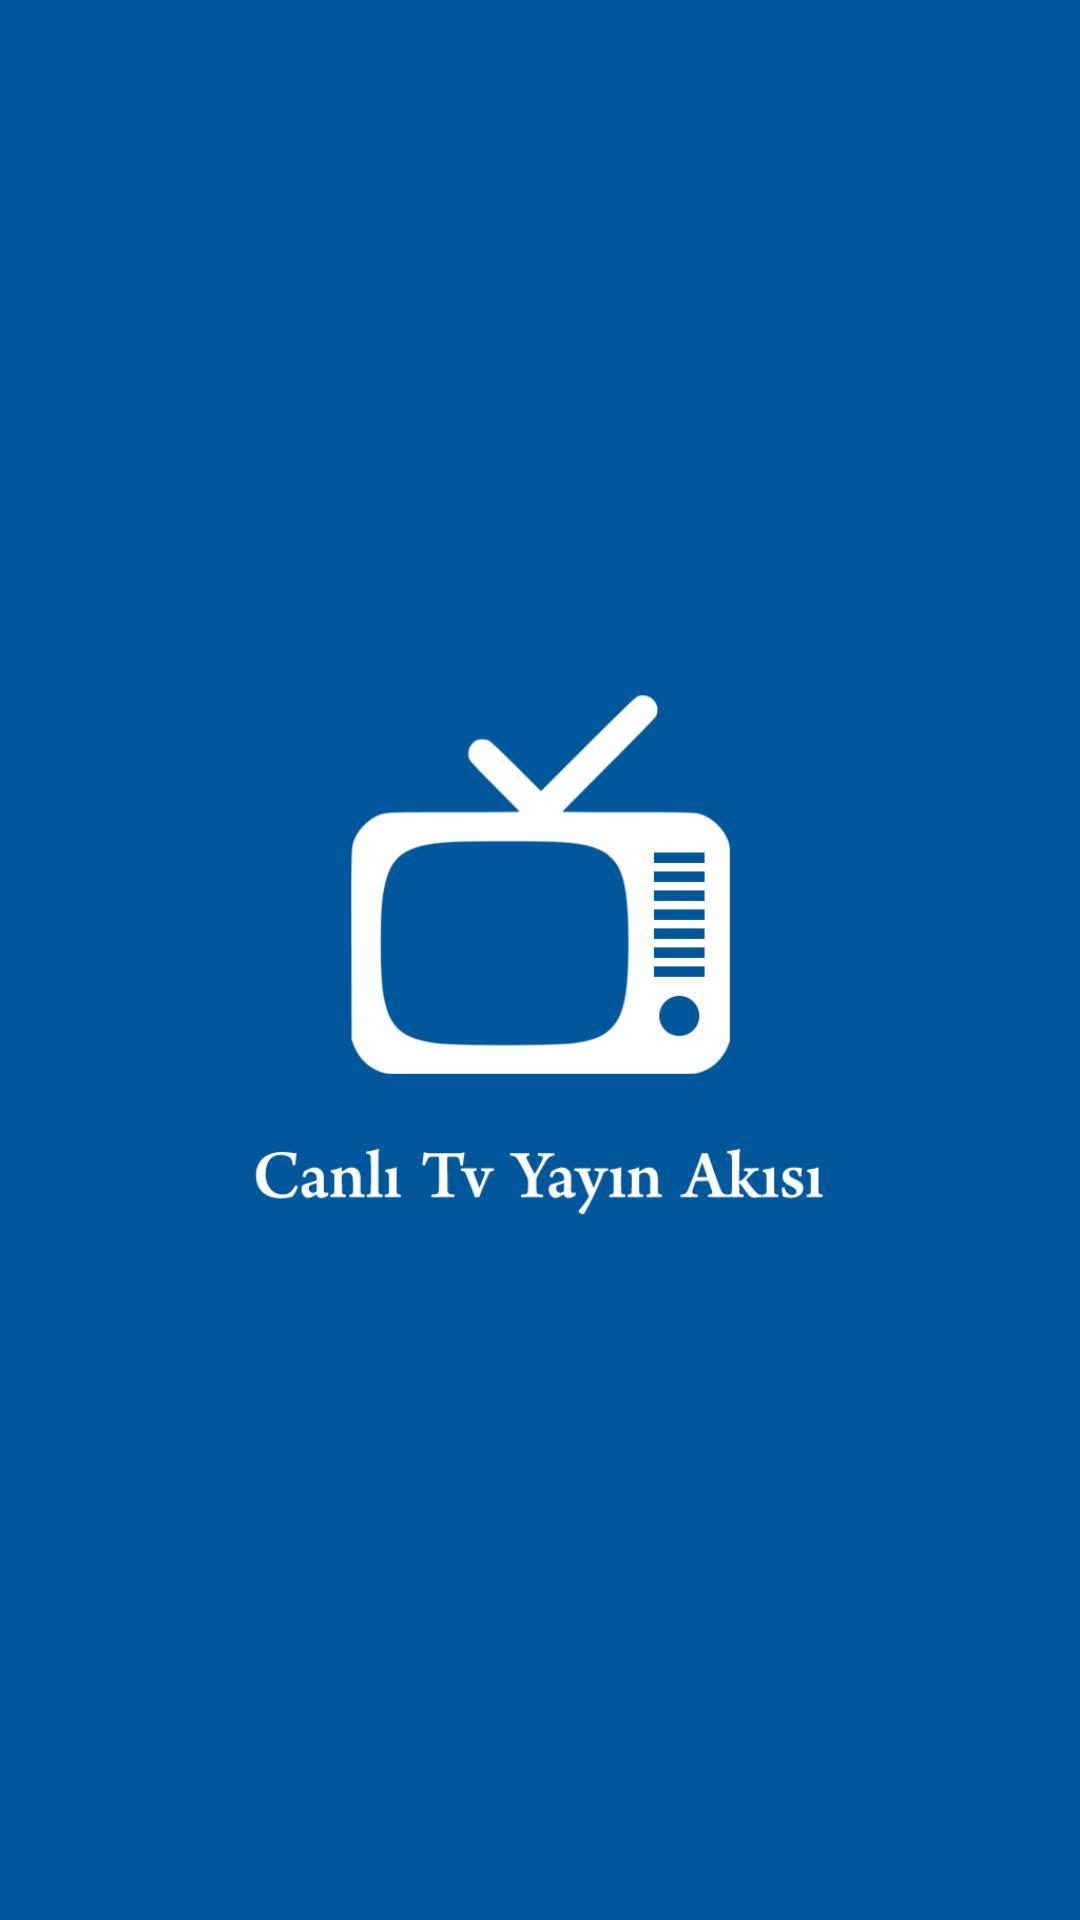 Canlı Tv Yayın Akışı for Android - APK Download